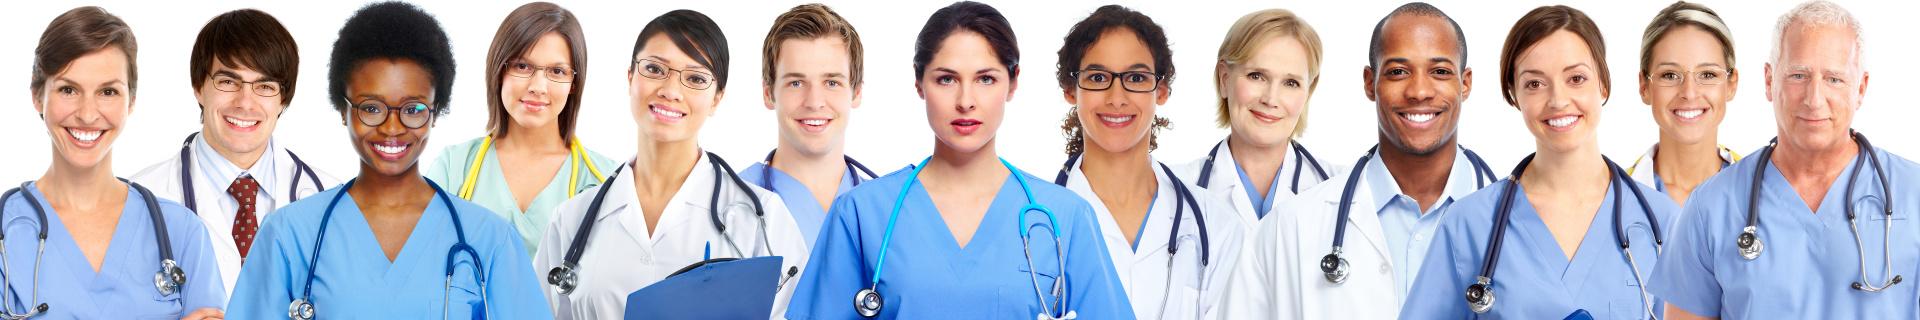 Nurse Experts